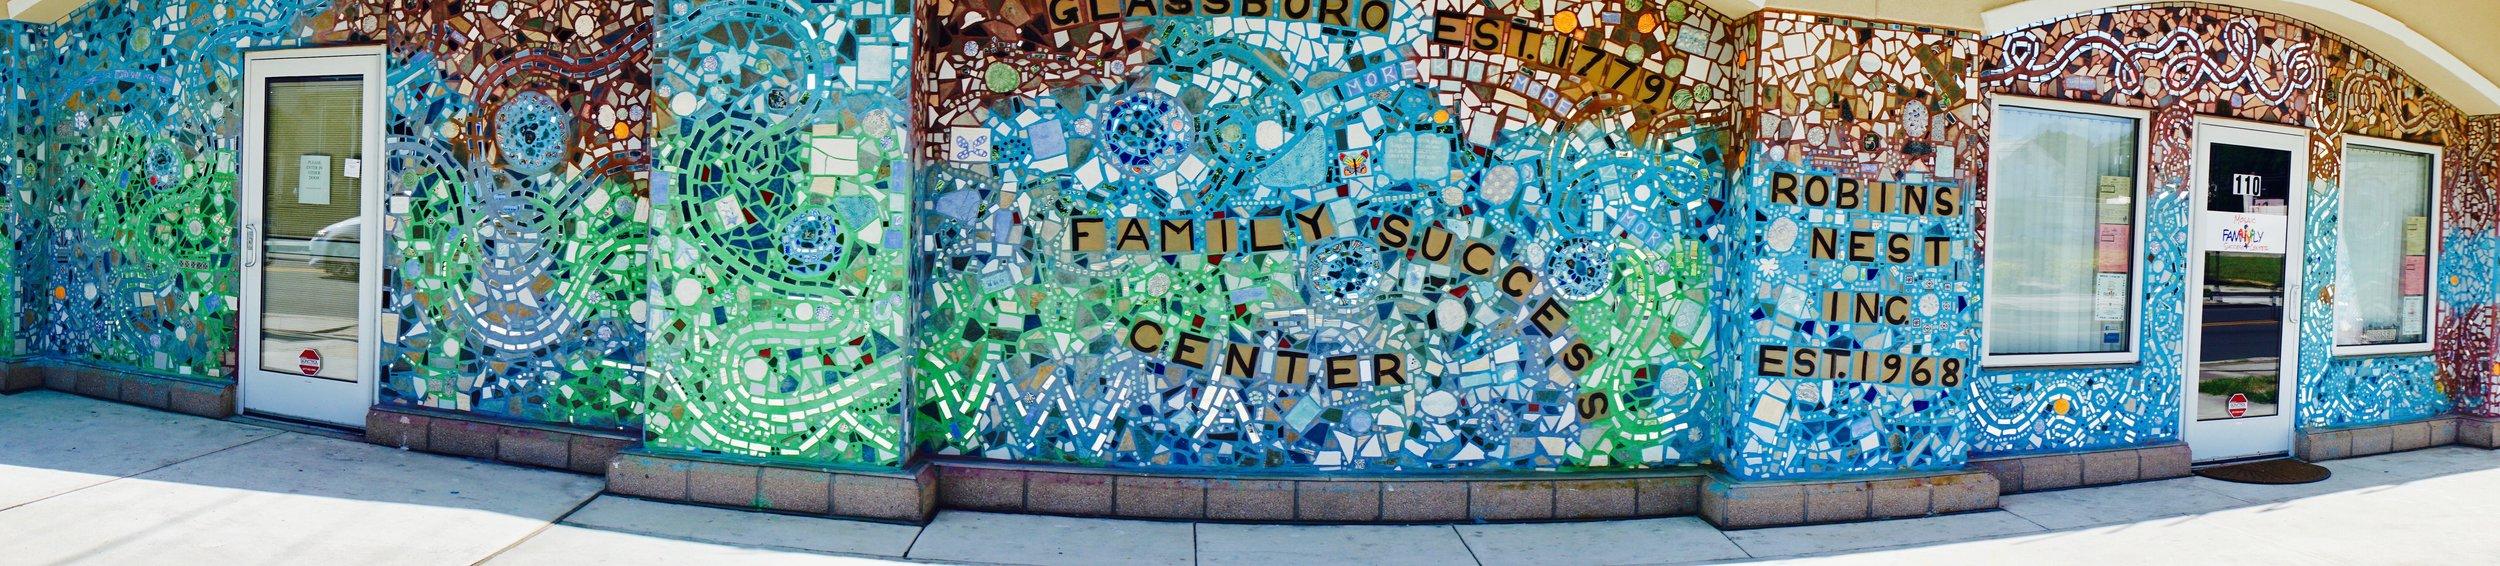 Isaiah Zagar Mosaic Mural for glassboro22.jpg